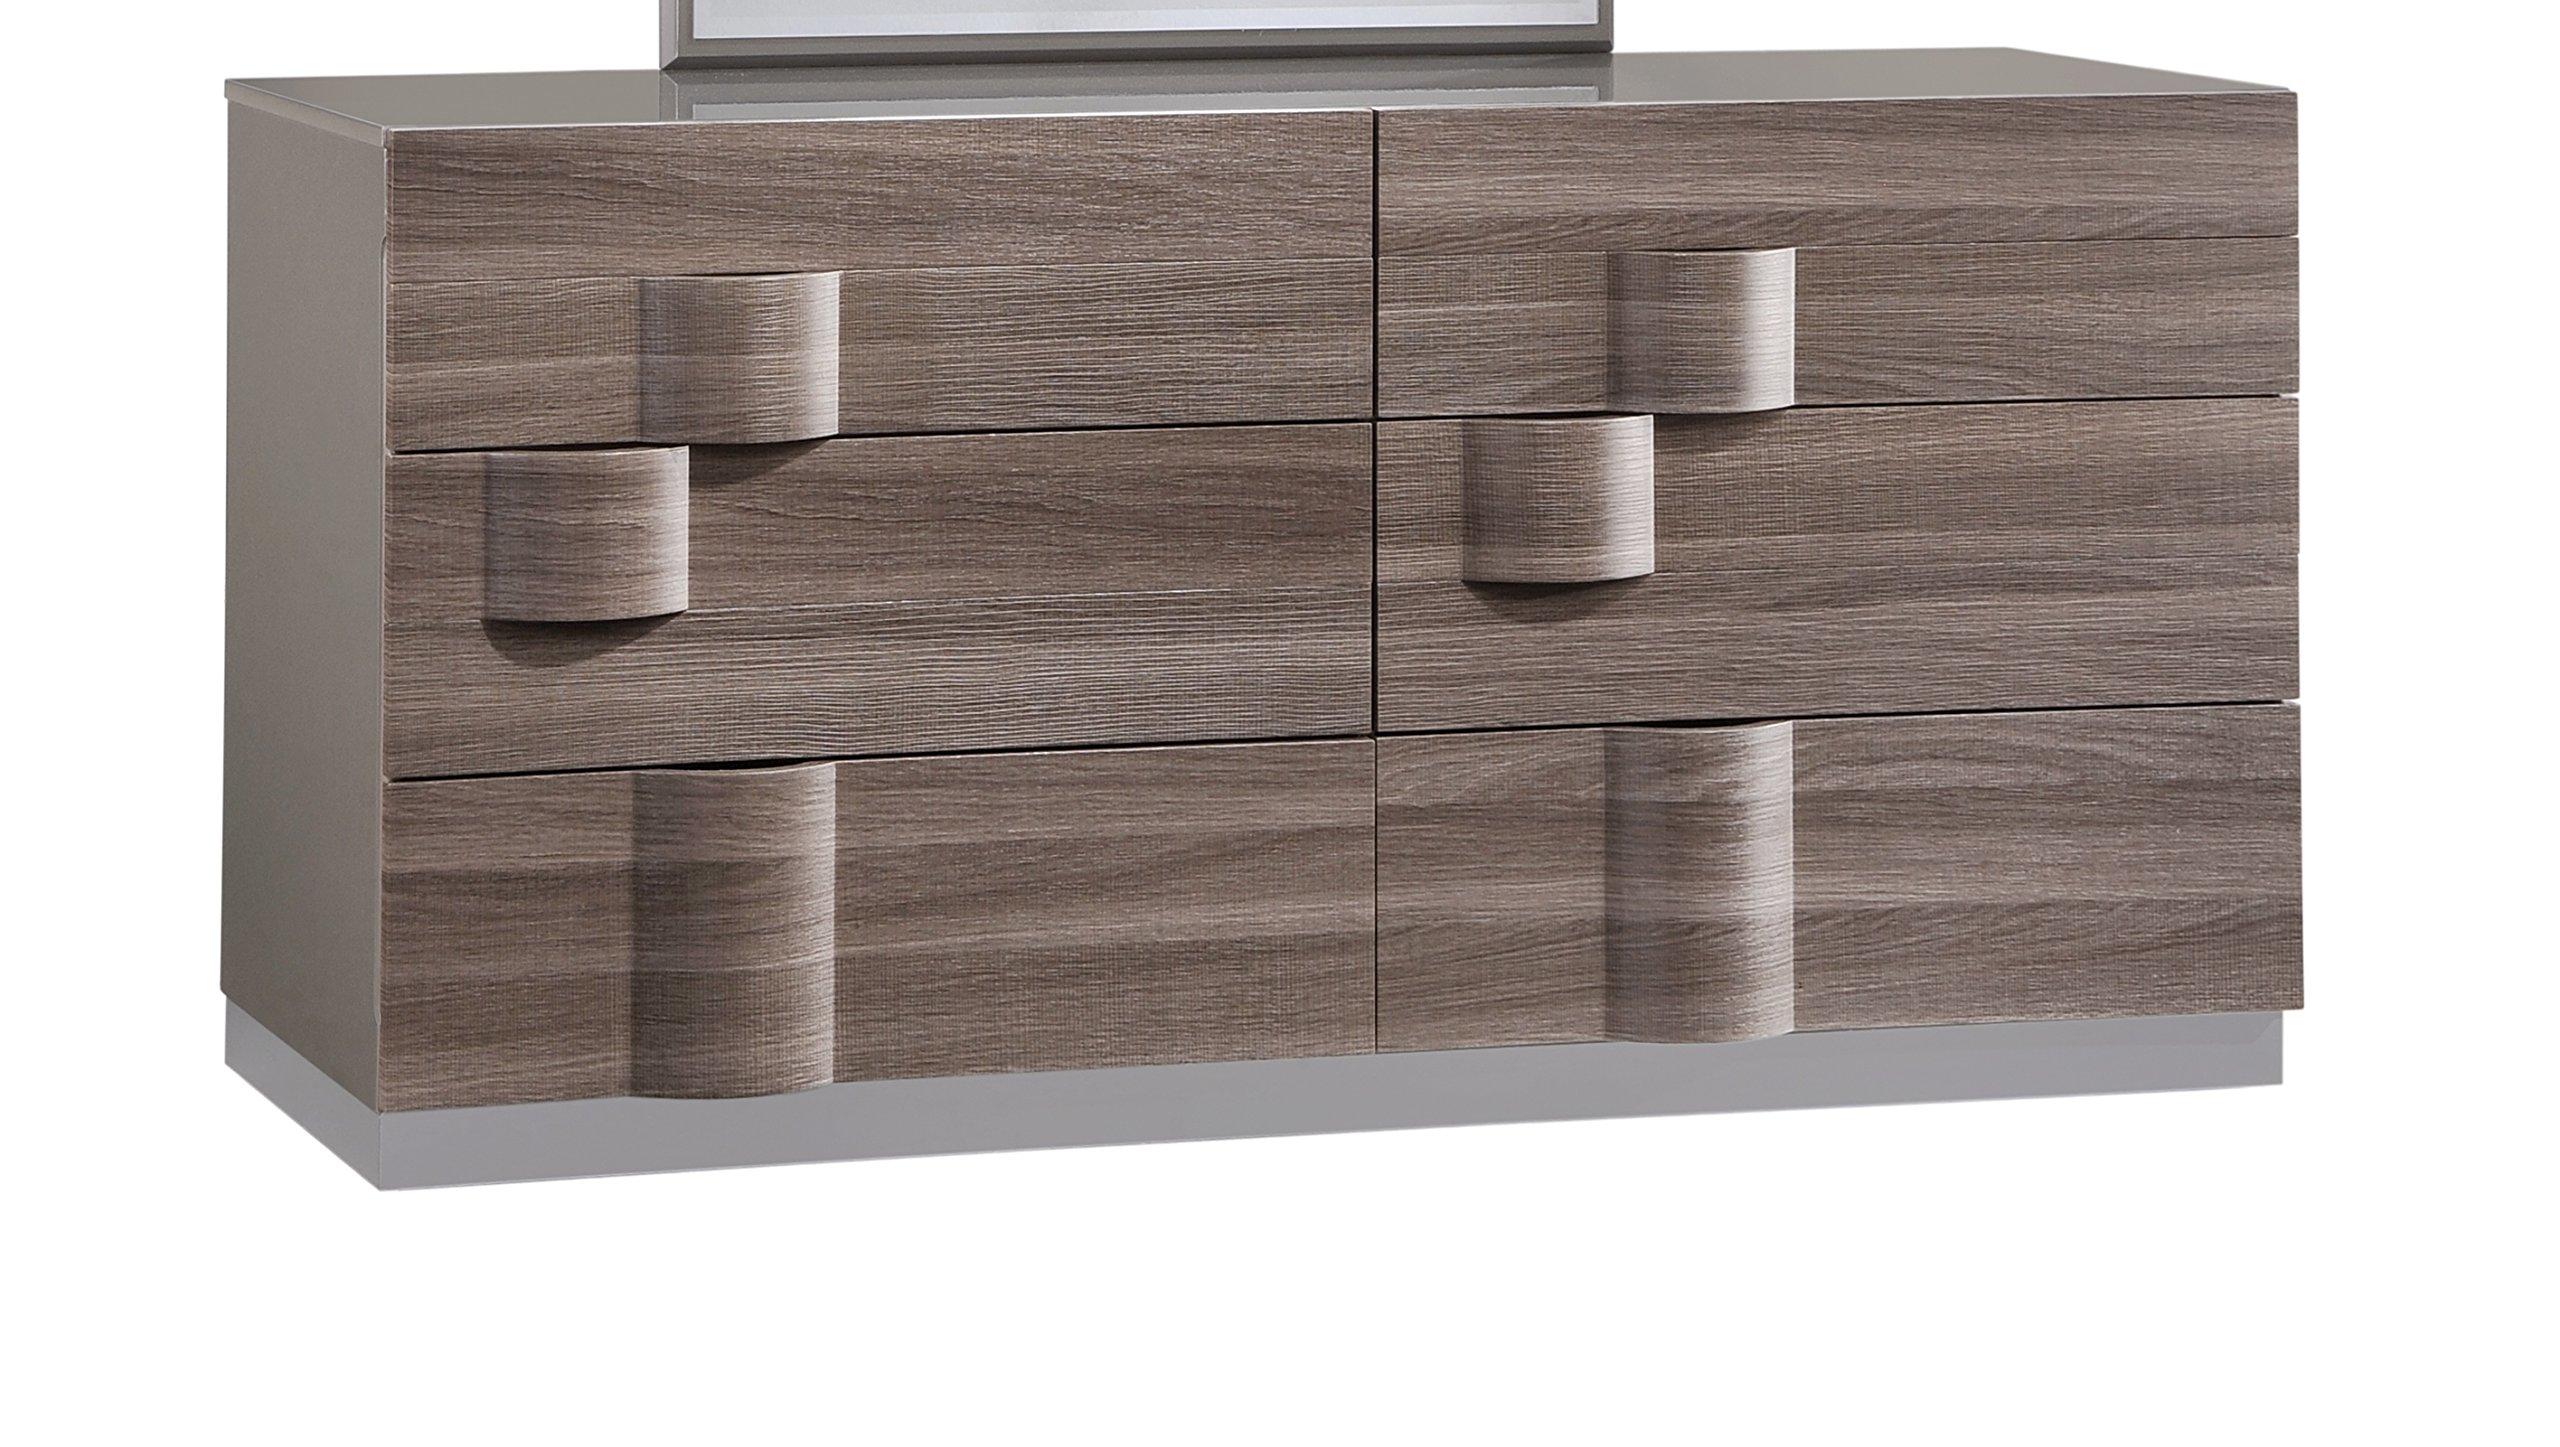 Global Furniture ADEL (119A)-DRESSER Dresser, 69'' x 20'' x 32'', Grey High Gloss & Zebra Wood